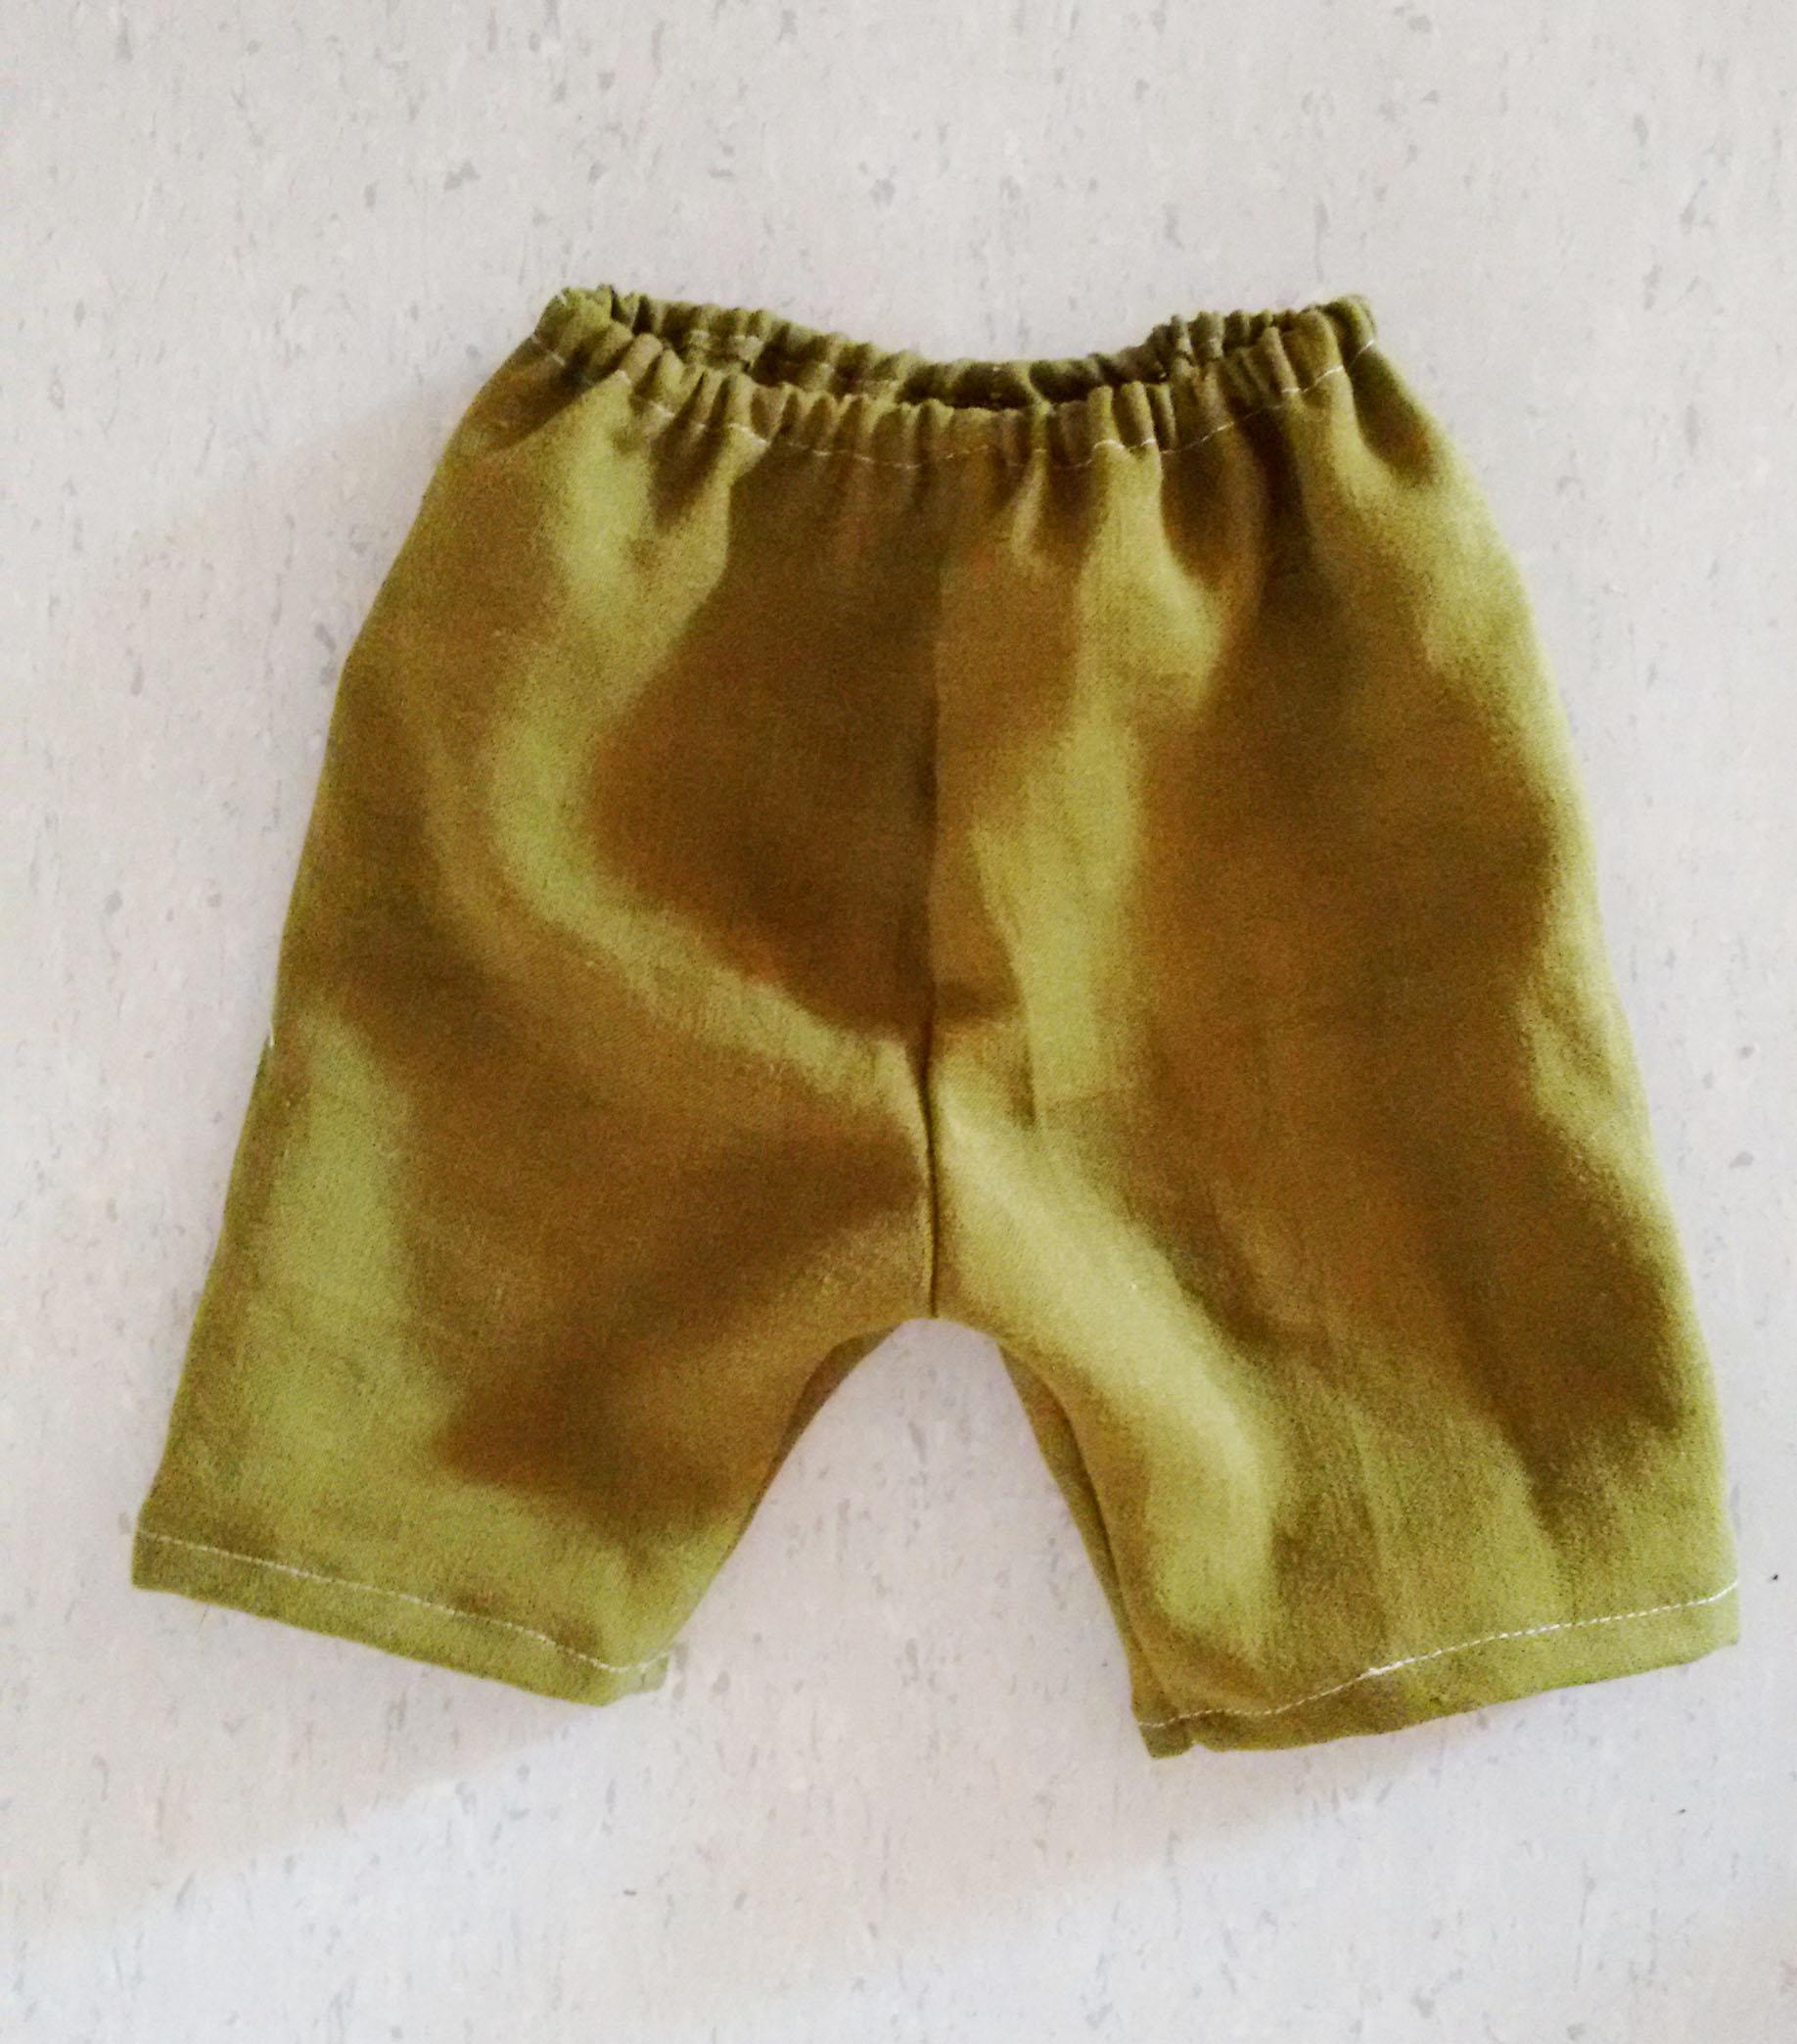 Einfache Kinderhose nähen - kostenloses Schnittmuster - DIY Kinder ...